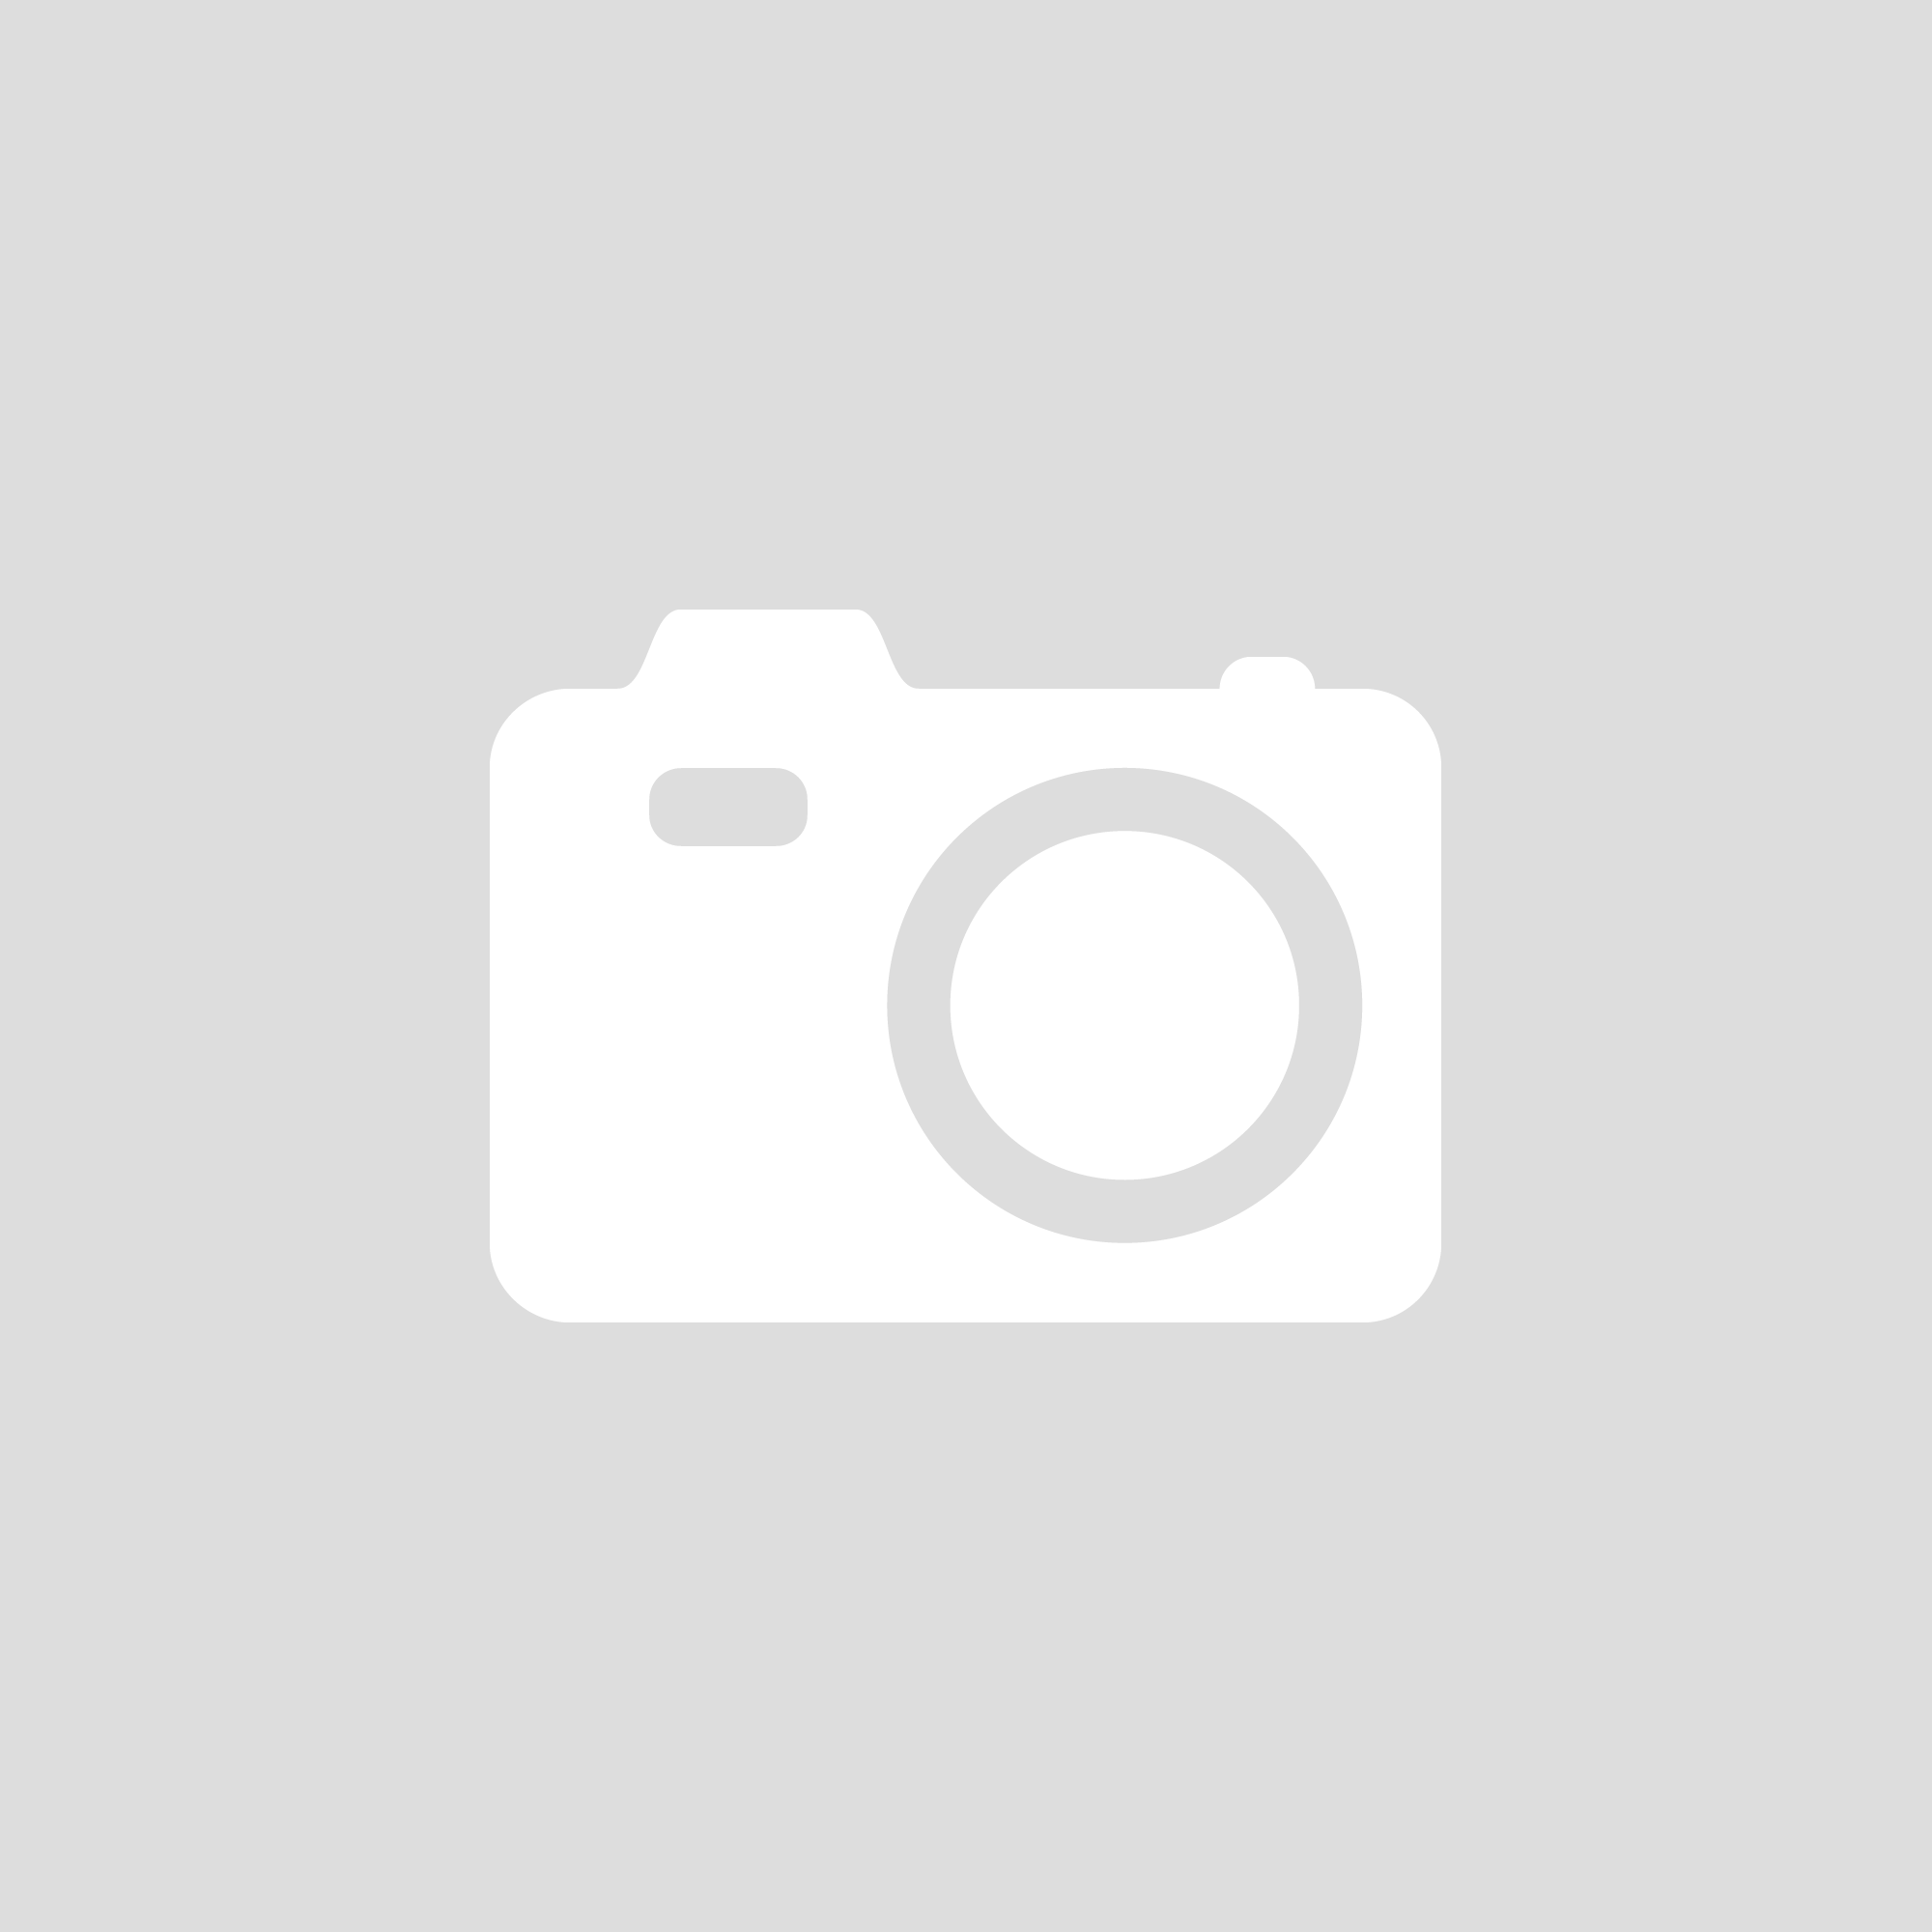 Chenille Beige / Gold Weave Heavyweight Wallpaper by Graham & Brown 101465